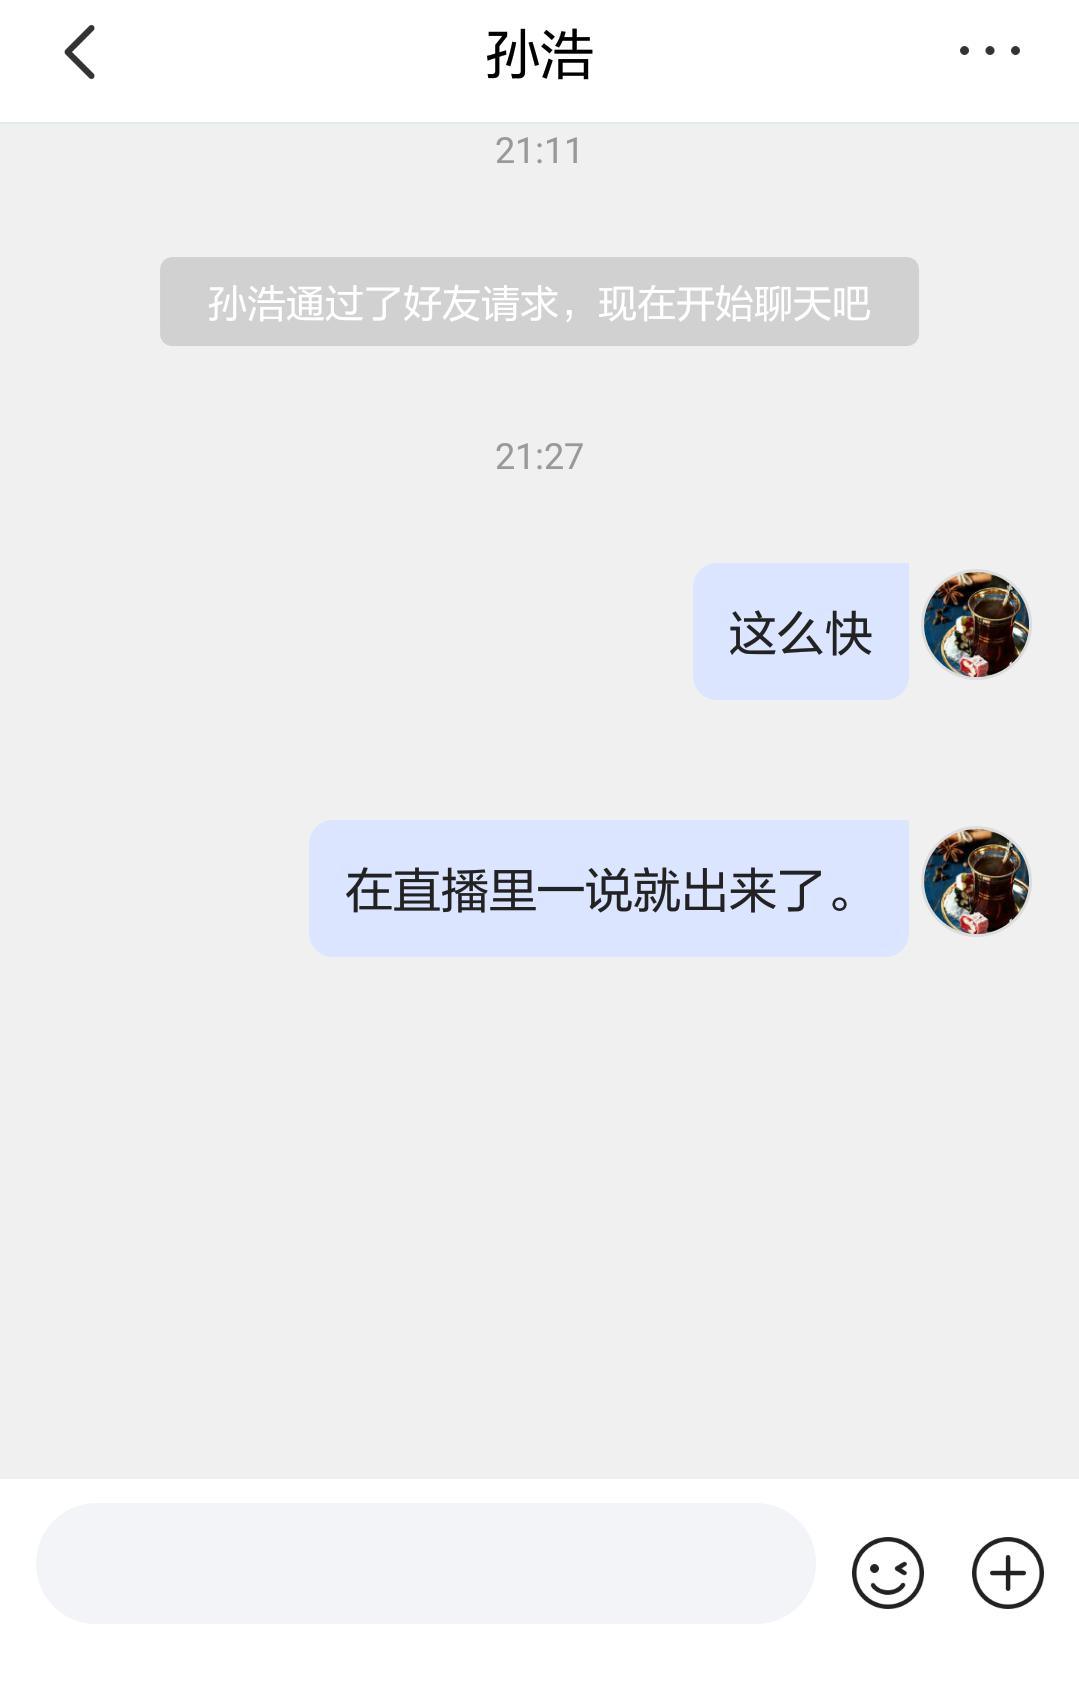 Screenshot_2019-08-16-21-27-57.png